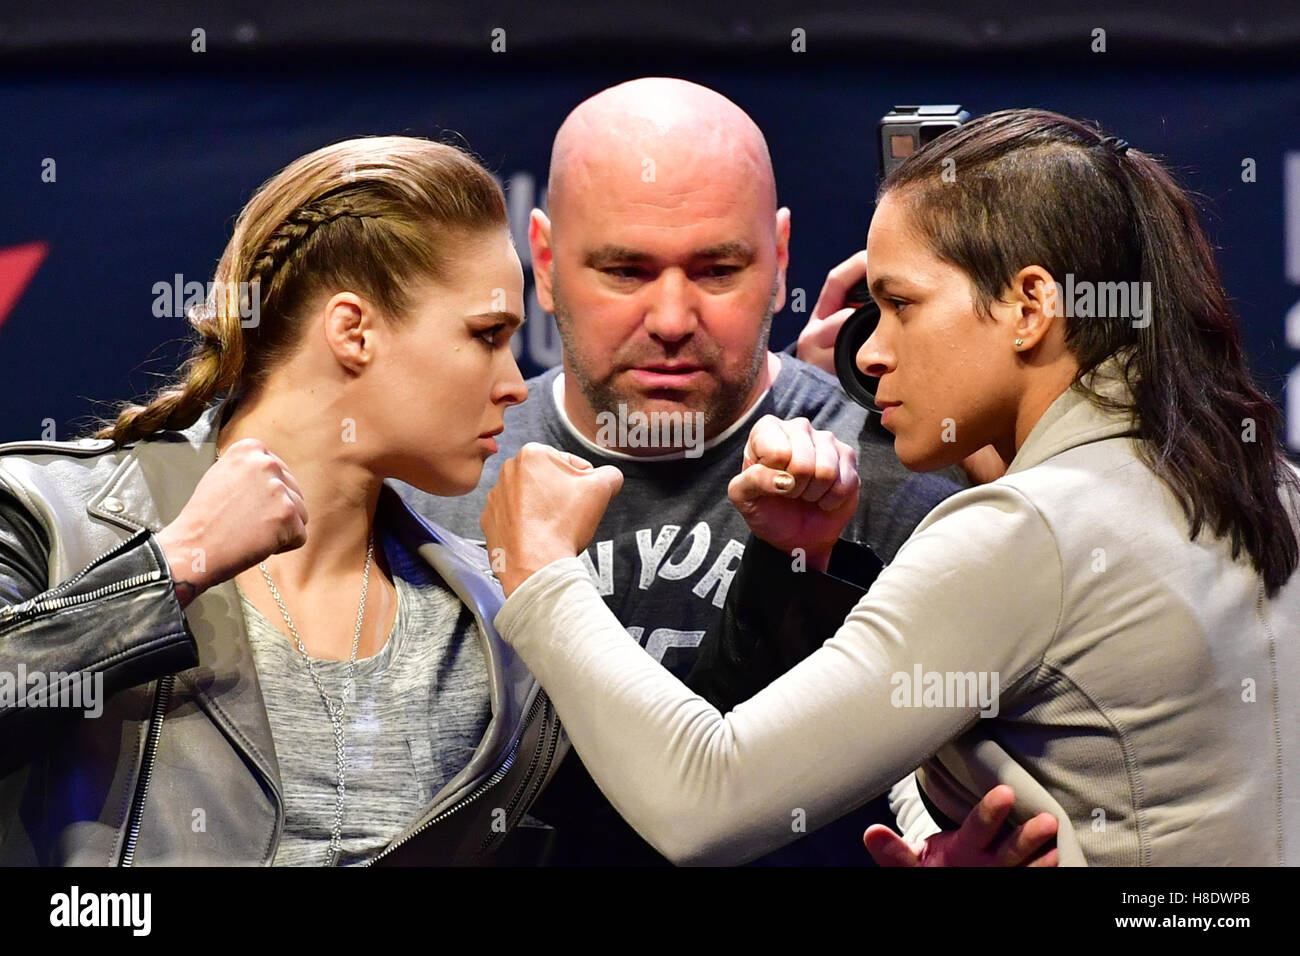 New York, NY, USA. 11, NOV, 2016. Ronda Rousey and Amanda Nunes during UFC 205 in Madison Square Garden. Credit: - Stock Image